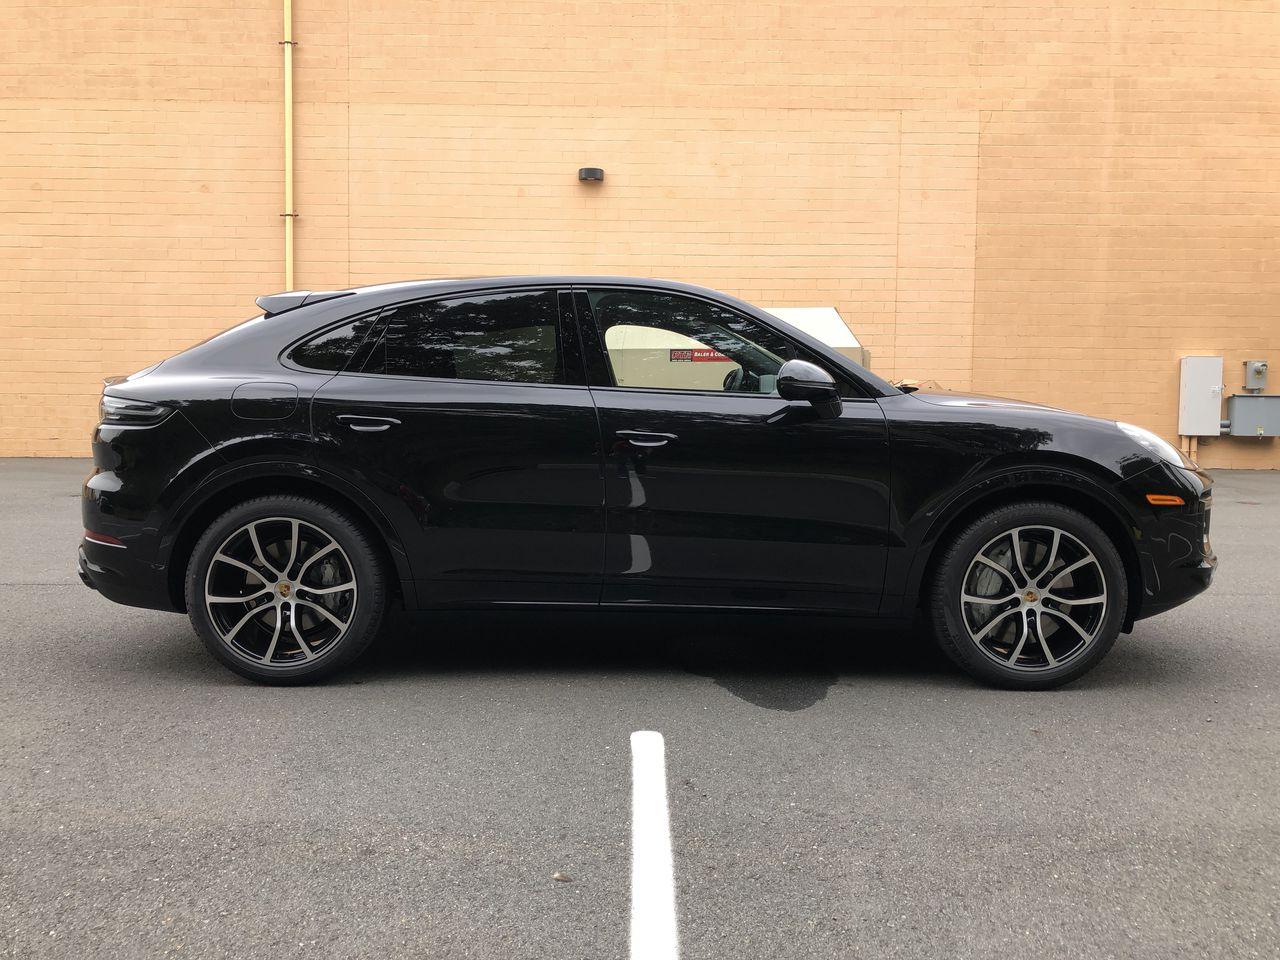 New 2020 Porsche Cayenne Turbo Coupe